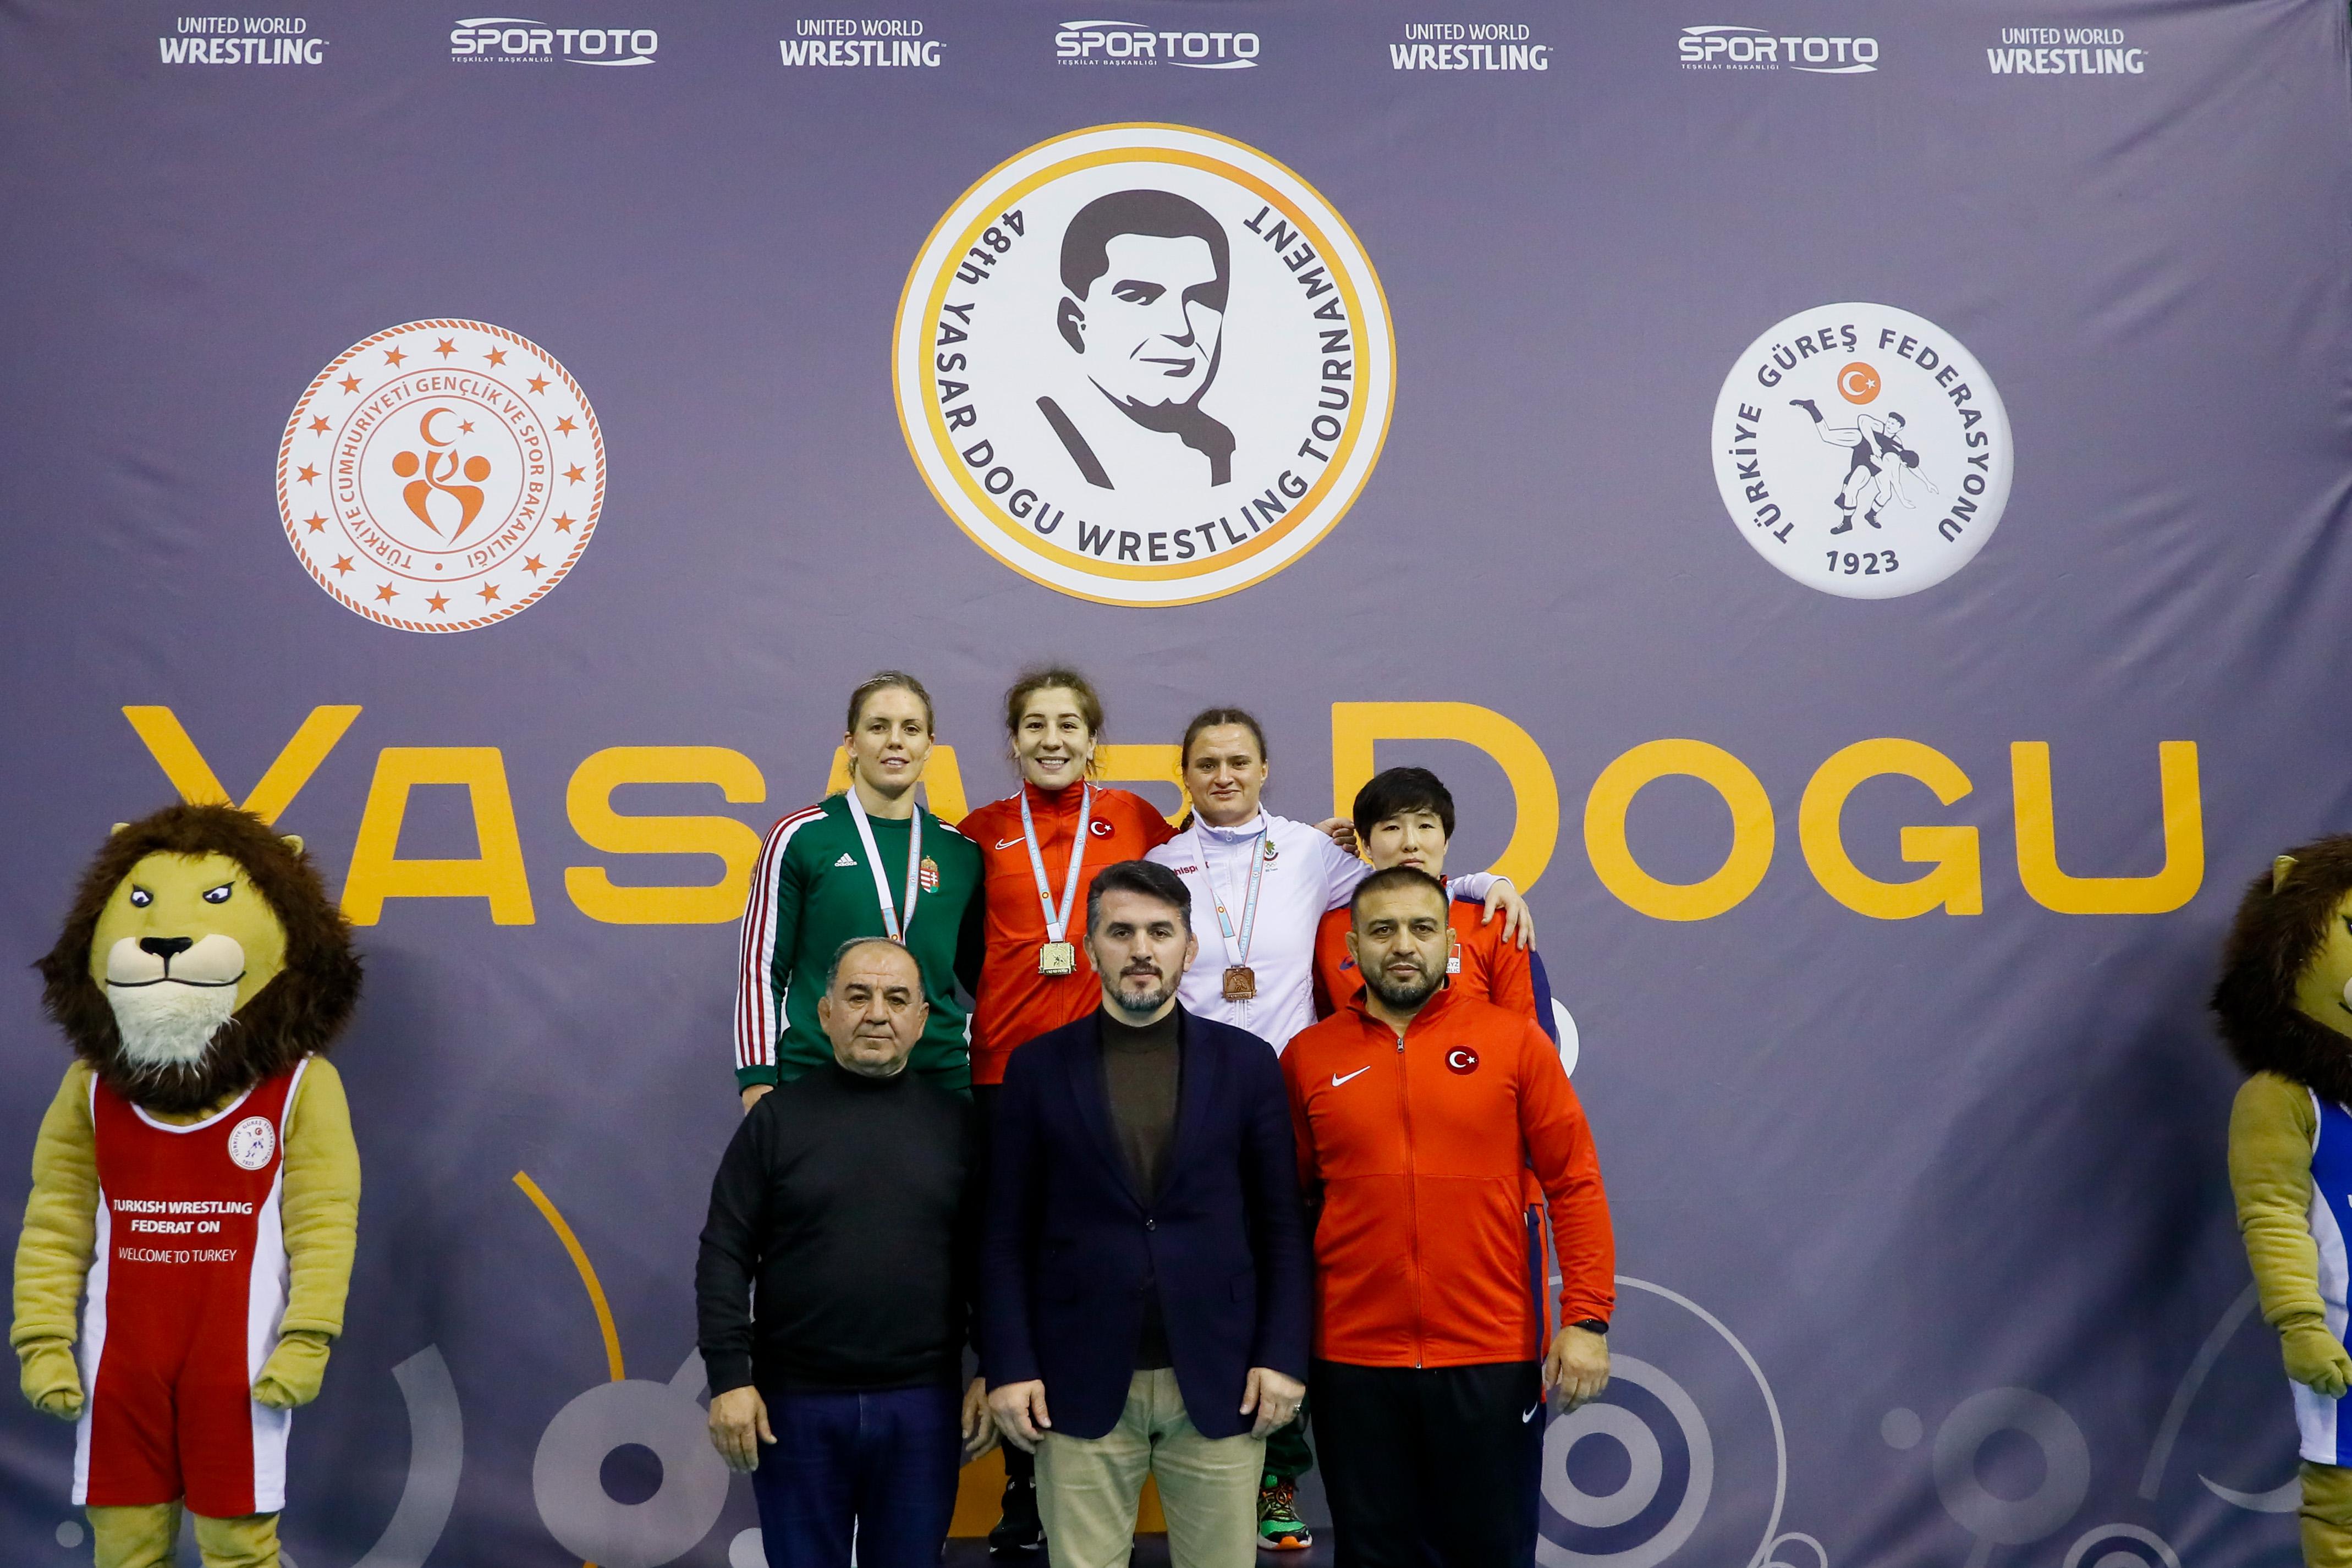 Мария Оряшкова с първи медал на международния тепих в борбата